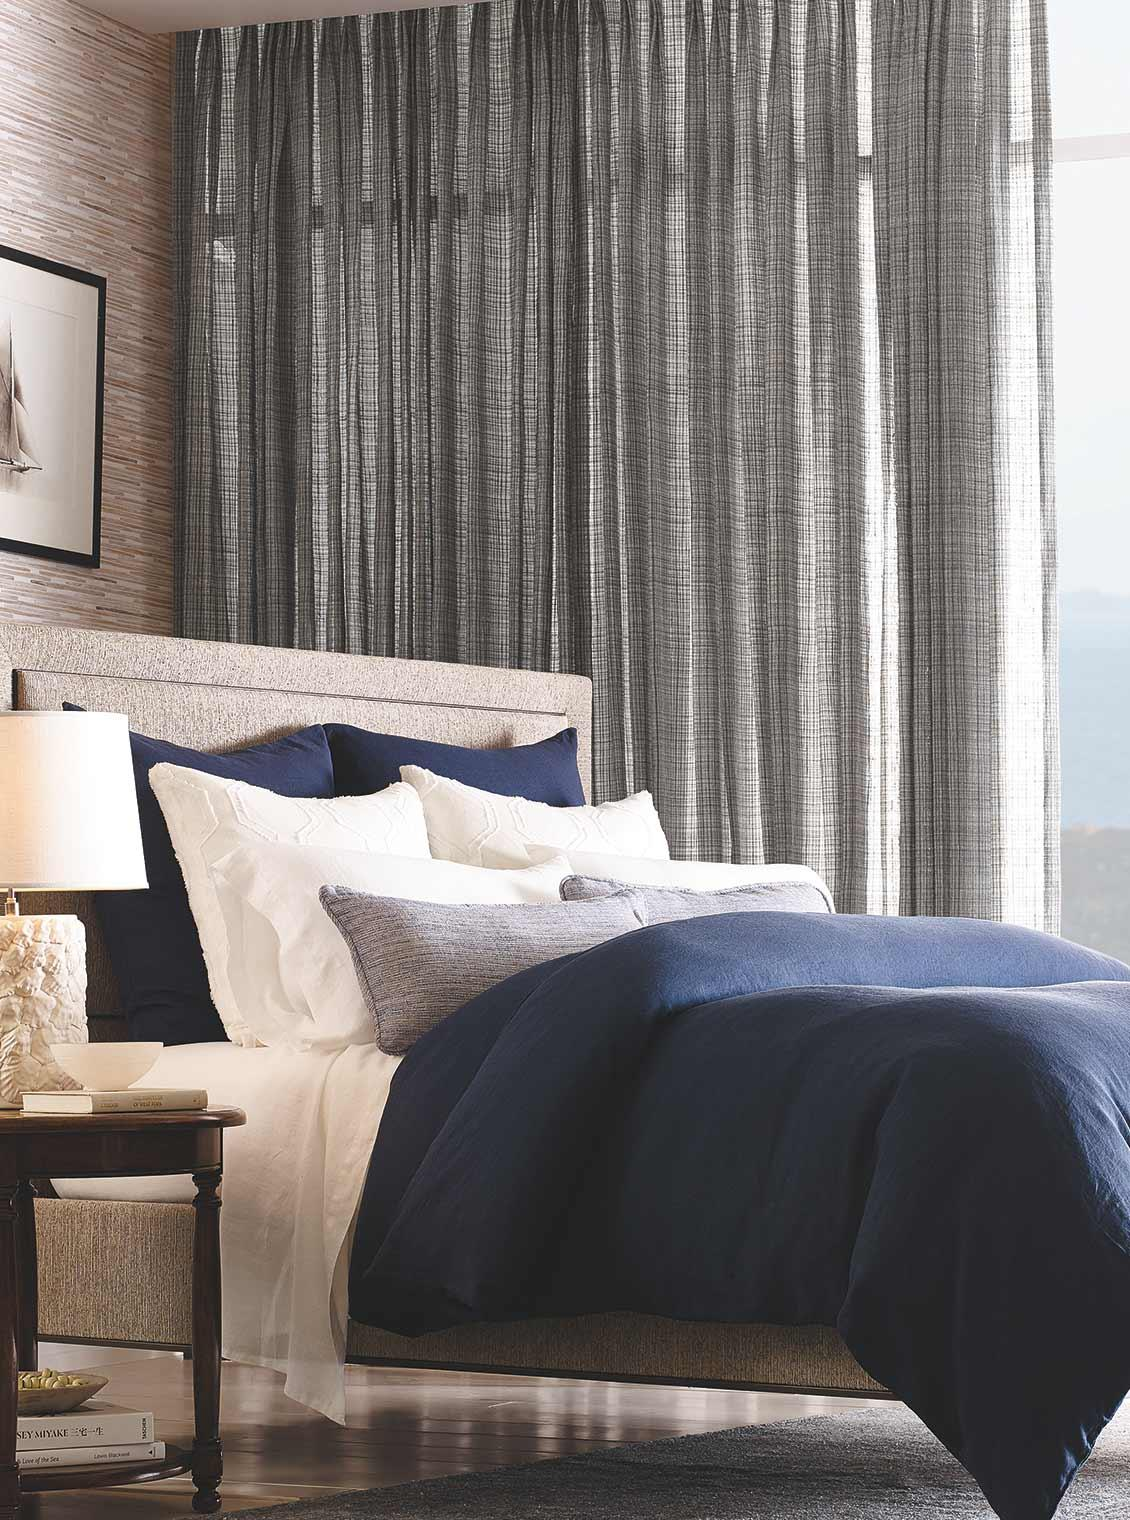 LE2260 Cobblestone | Bed - Jun Ho courtesy of Thomas Lavin